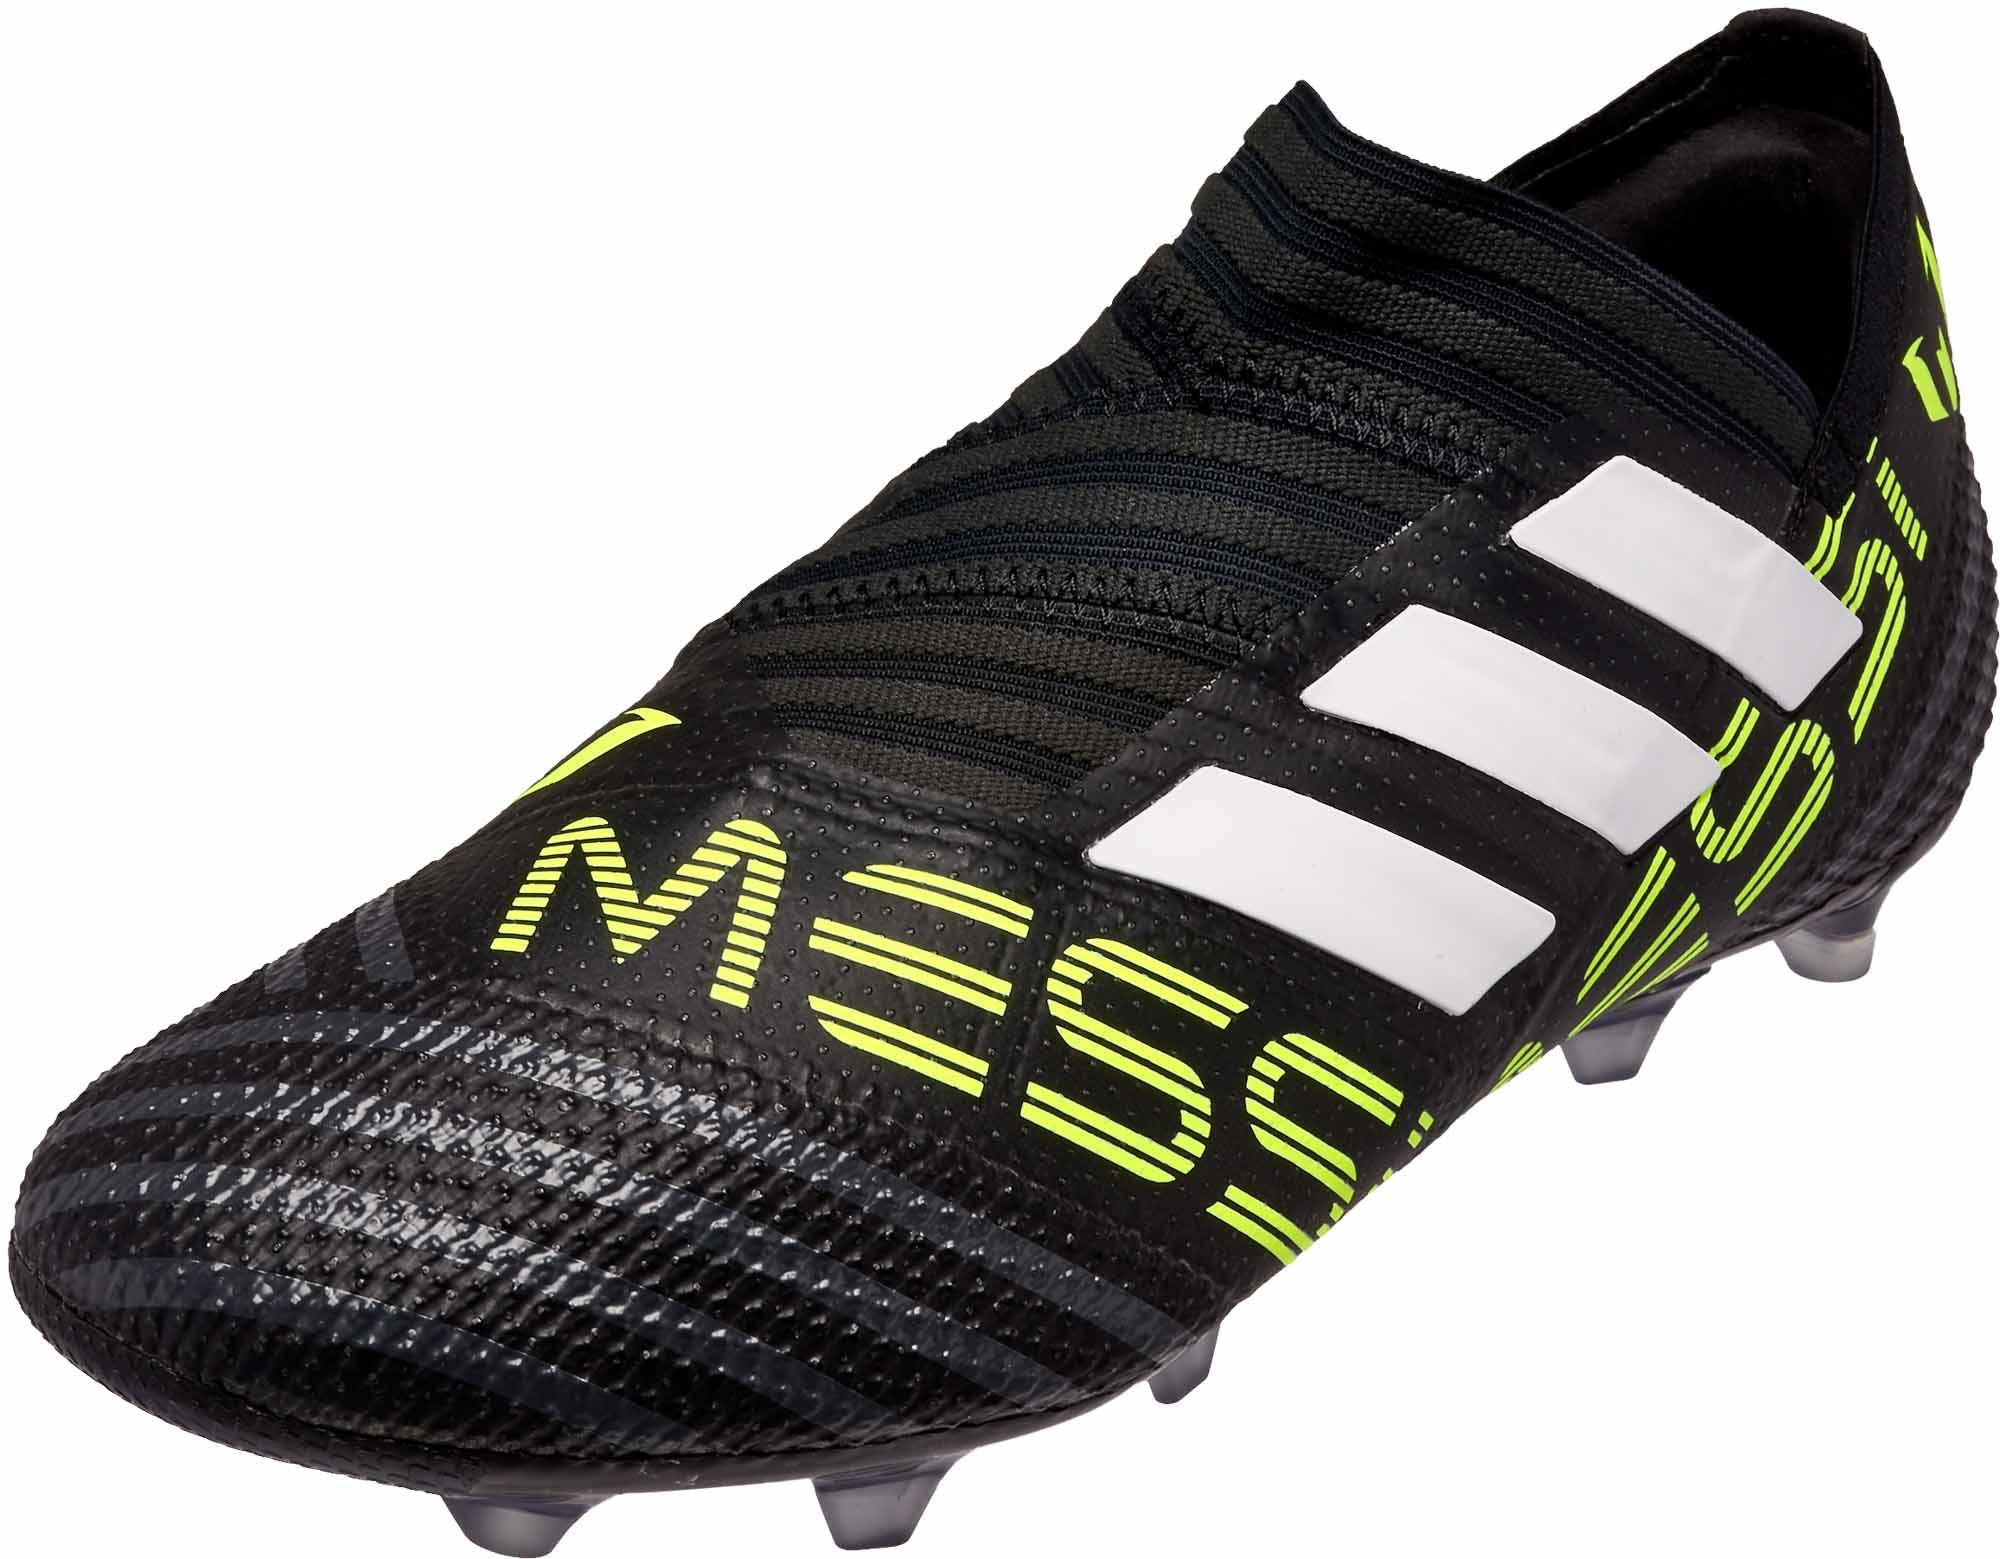 209e77c52a0f8c adidas Kids Nemeziz Messi 17+ 360Agility FG - Black   Solar Yellow ...